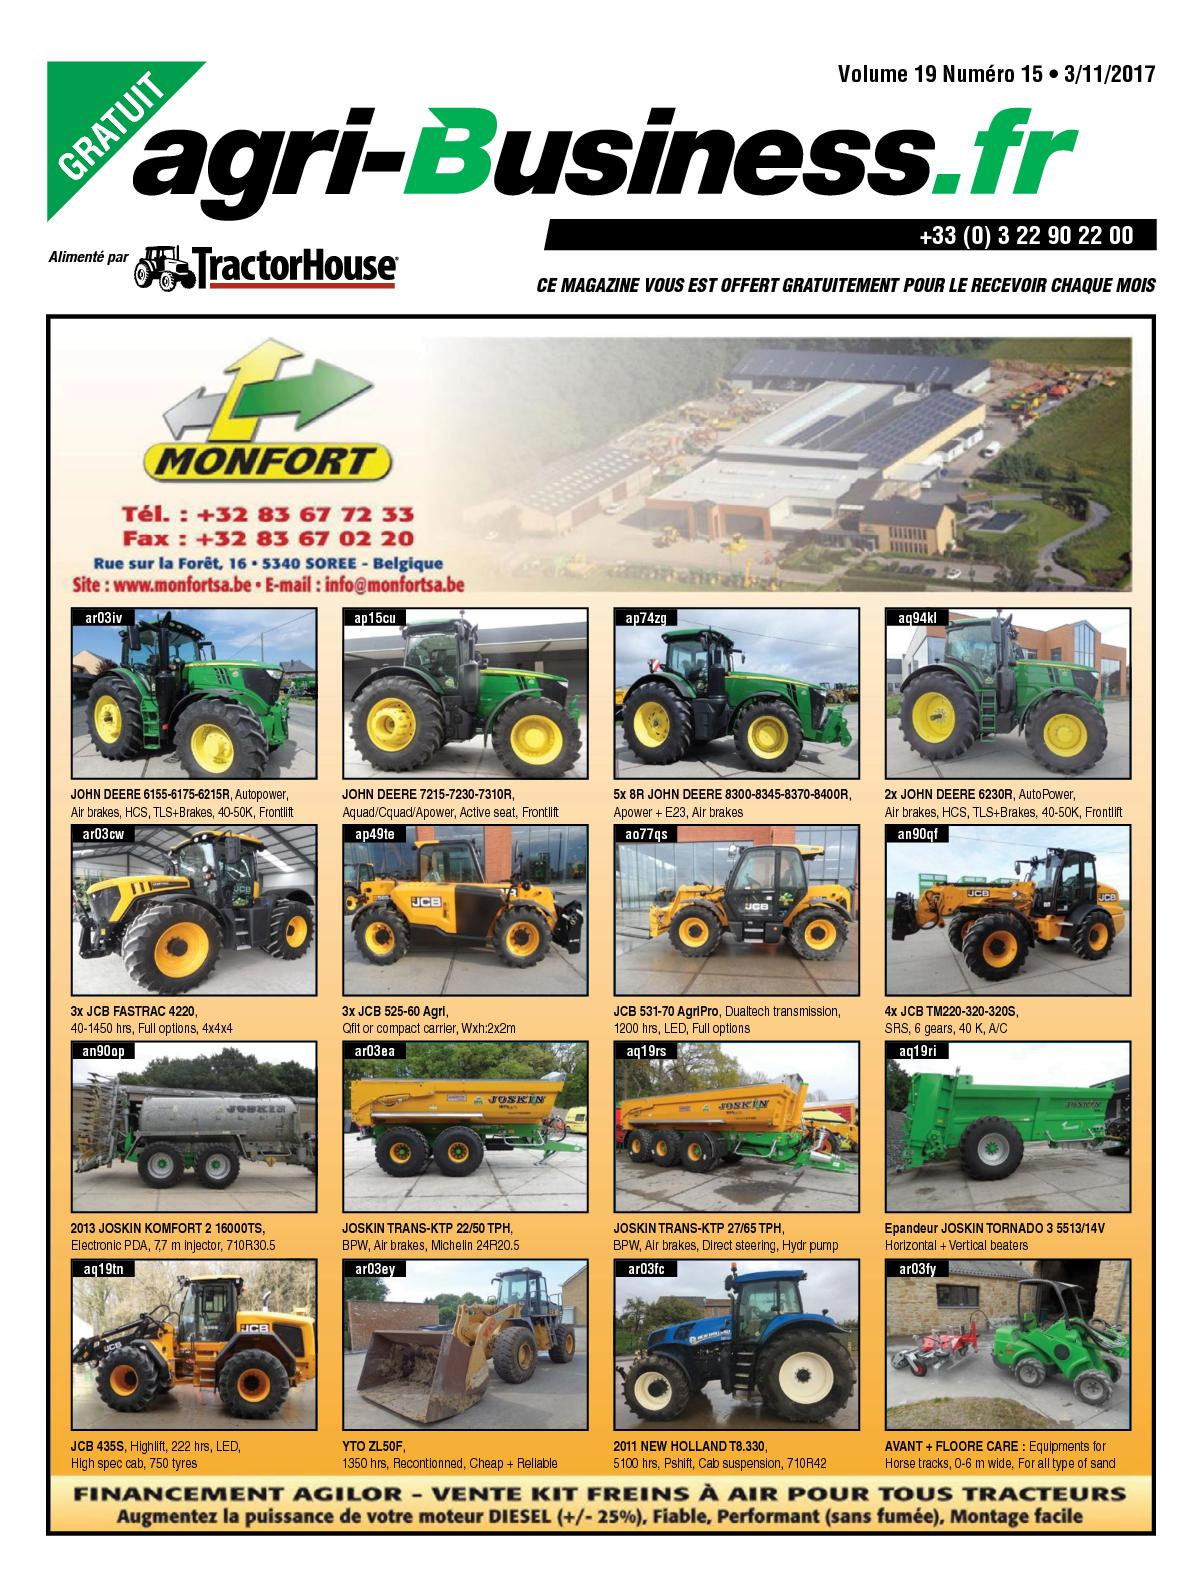 calaméo agri business volume 19 numÉro 15 03 11 2017